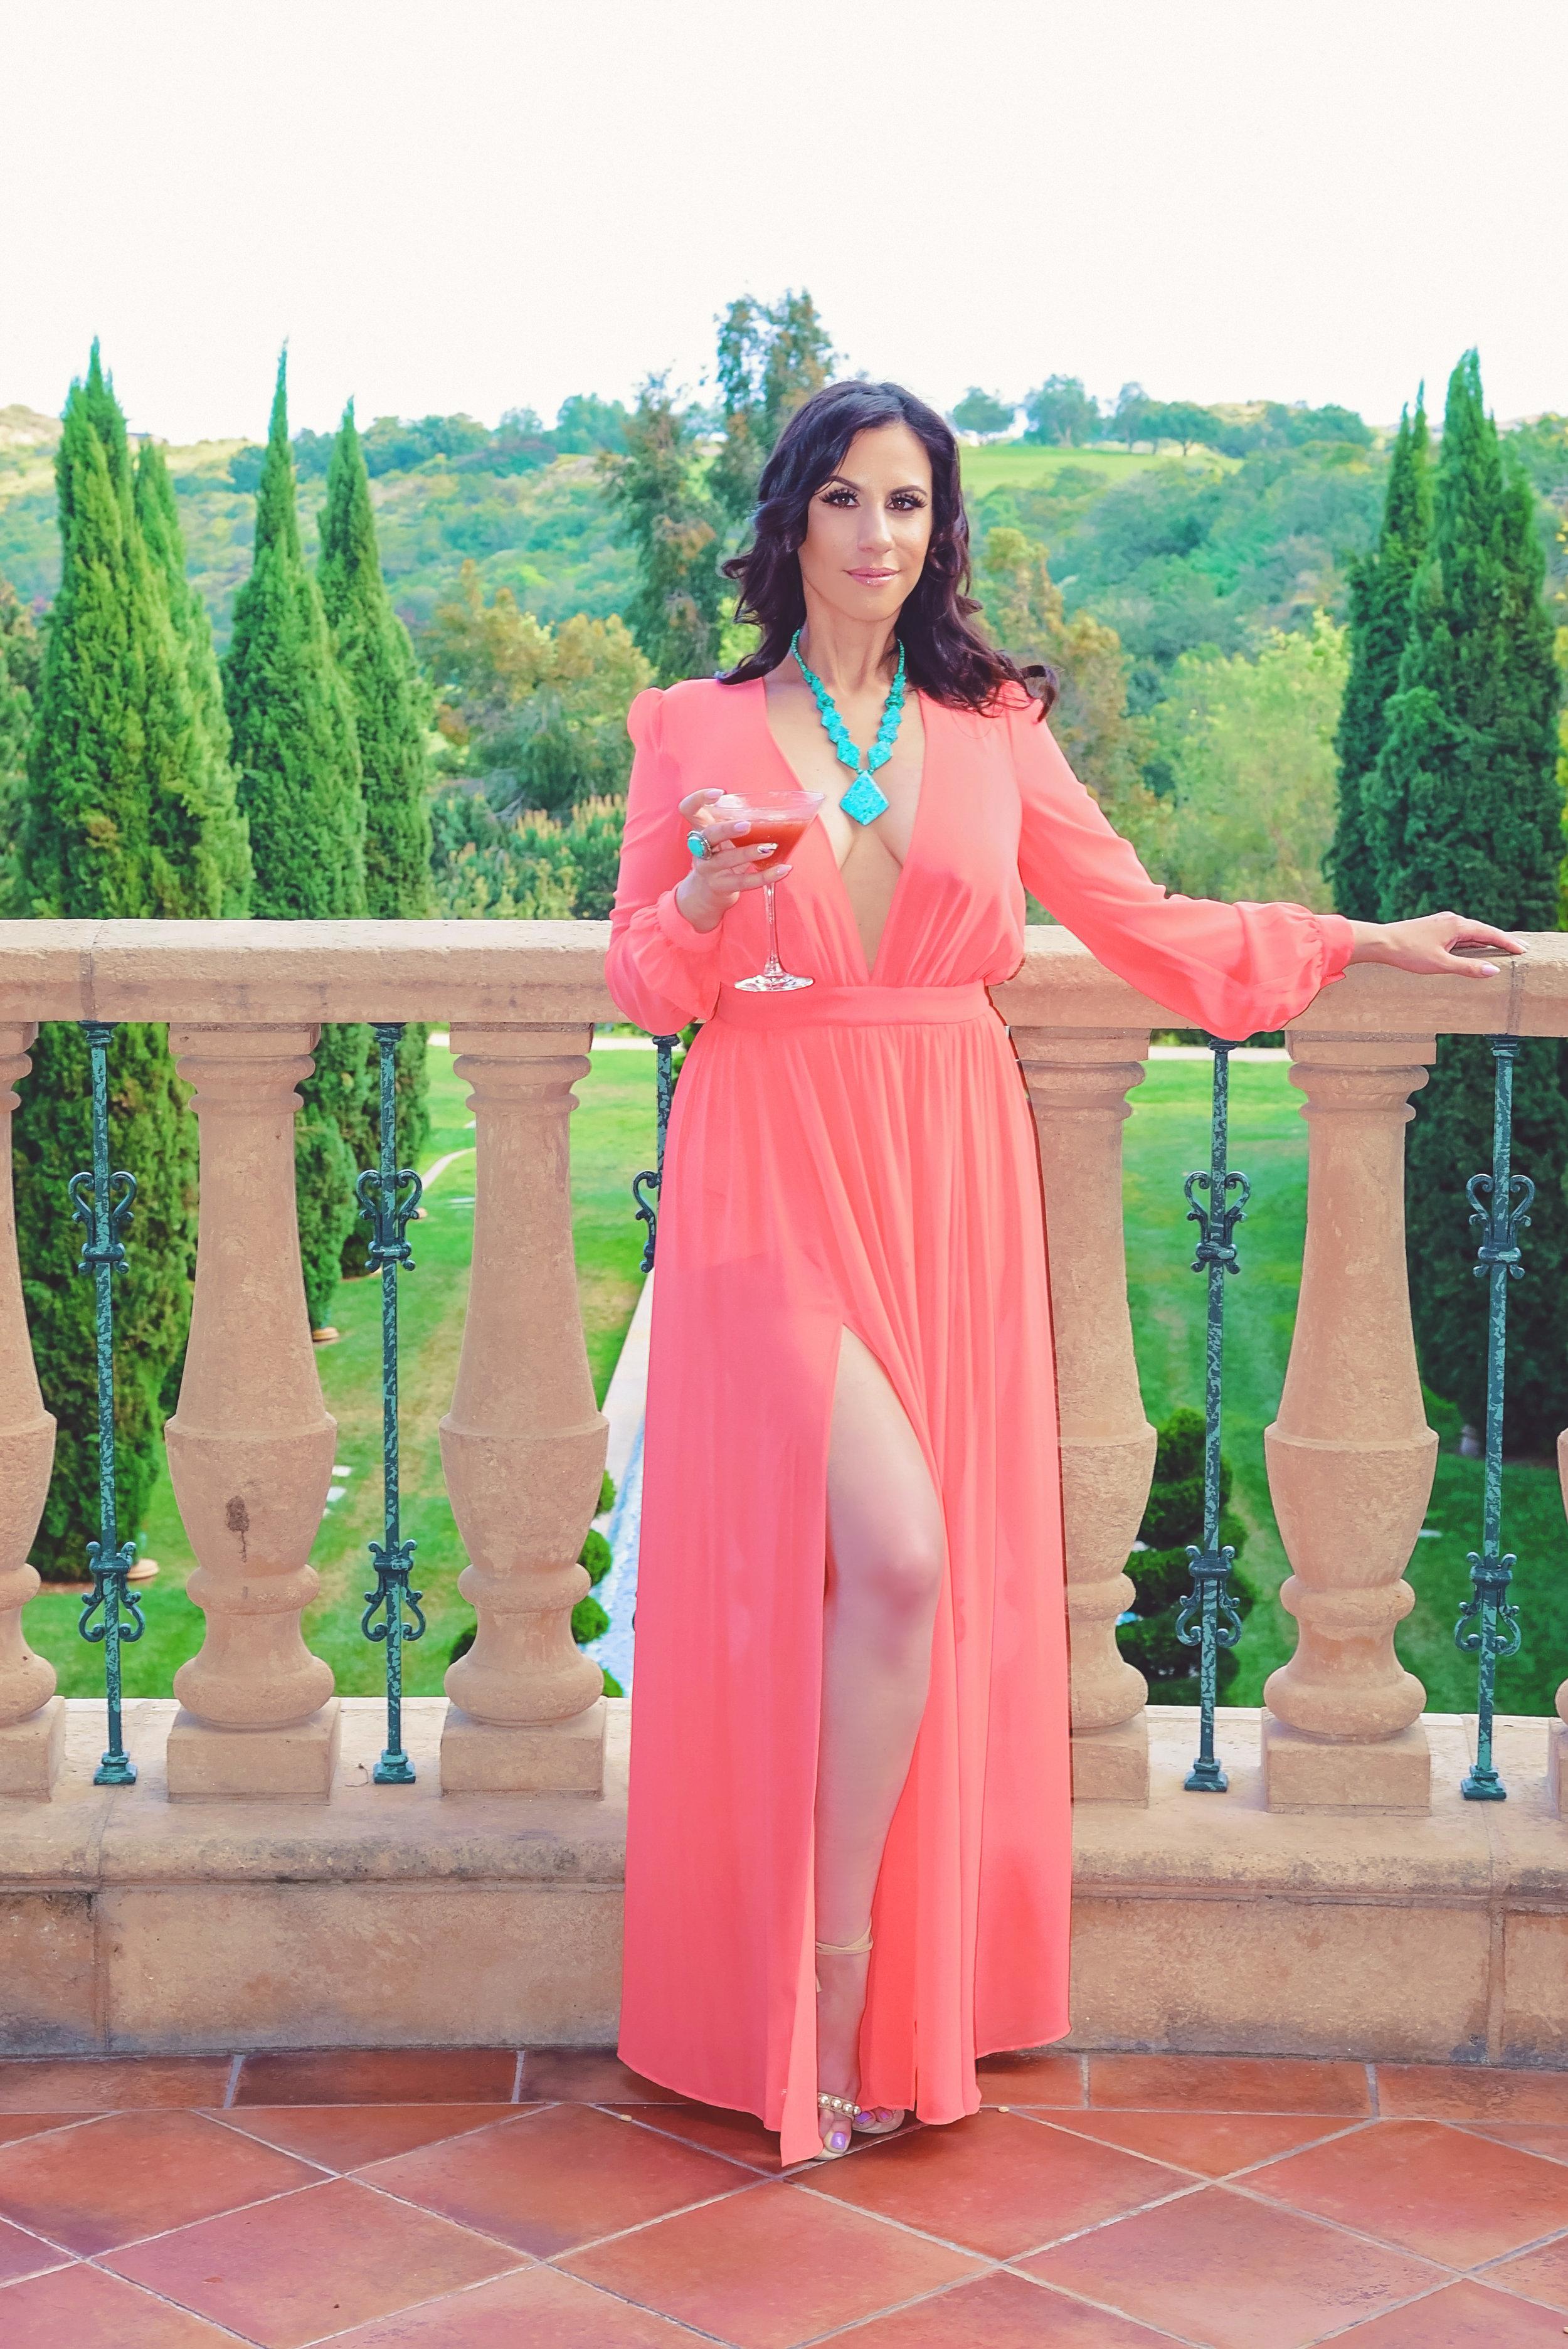 Fashion Pink Dress Aqua Necklace | Fashion Photography | Lacey O